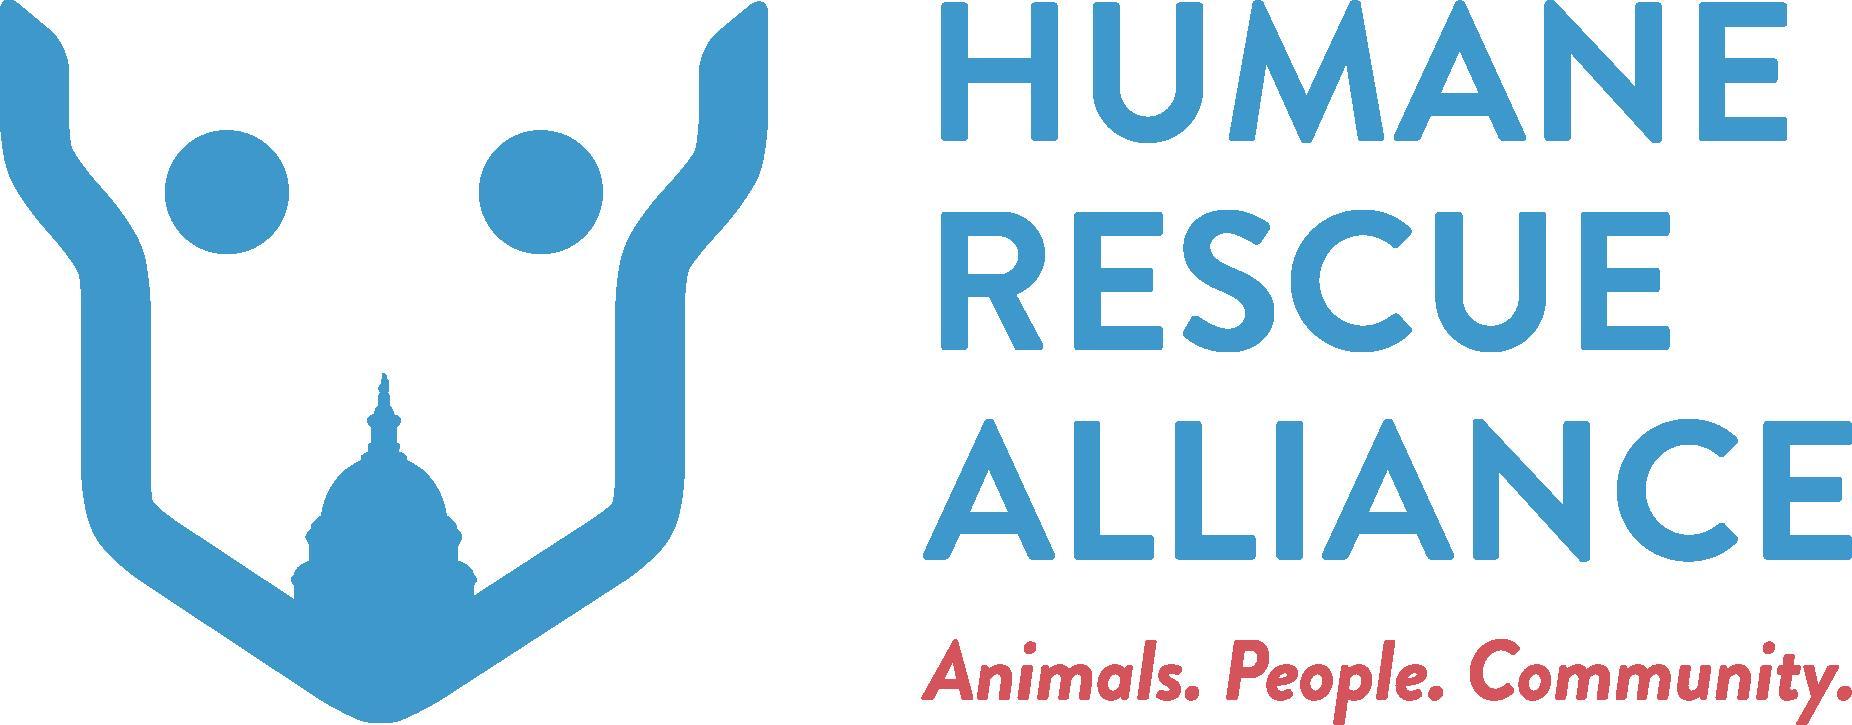 humane rescue alliance logo.jpg